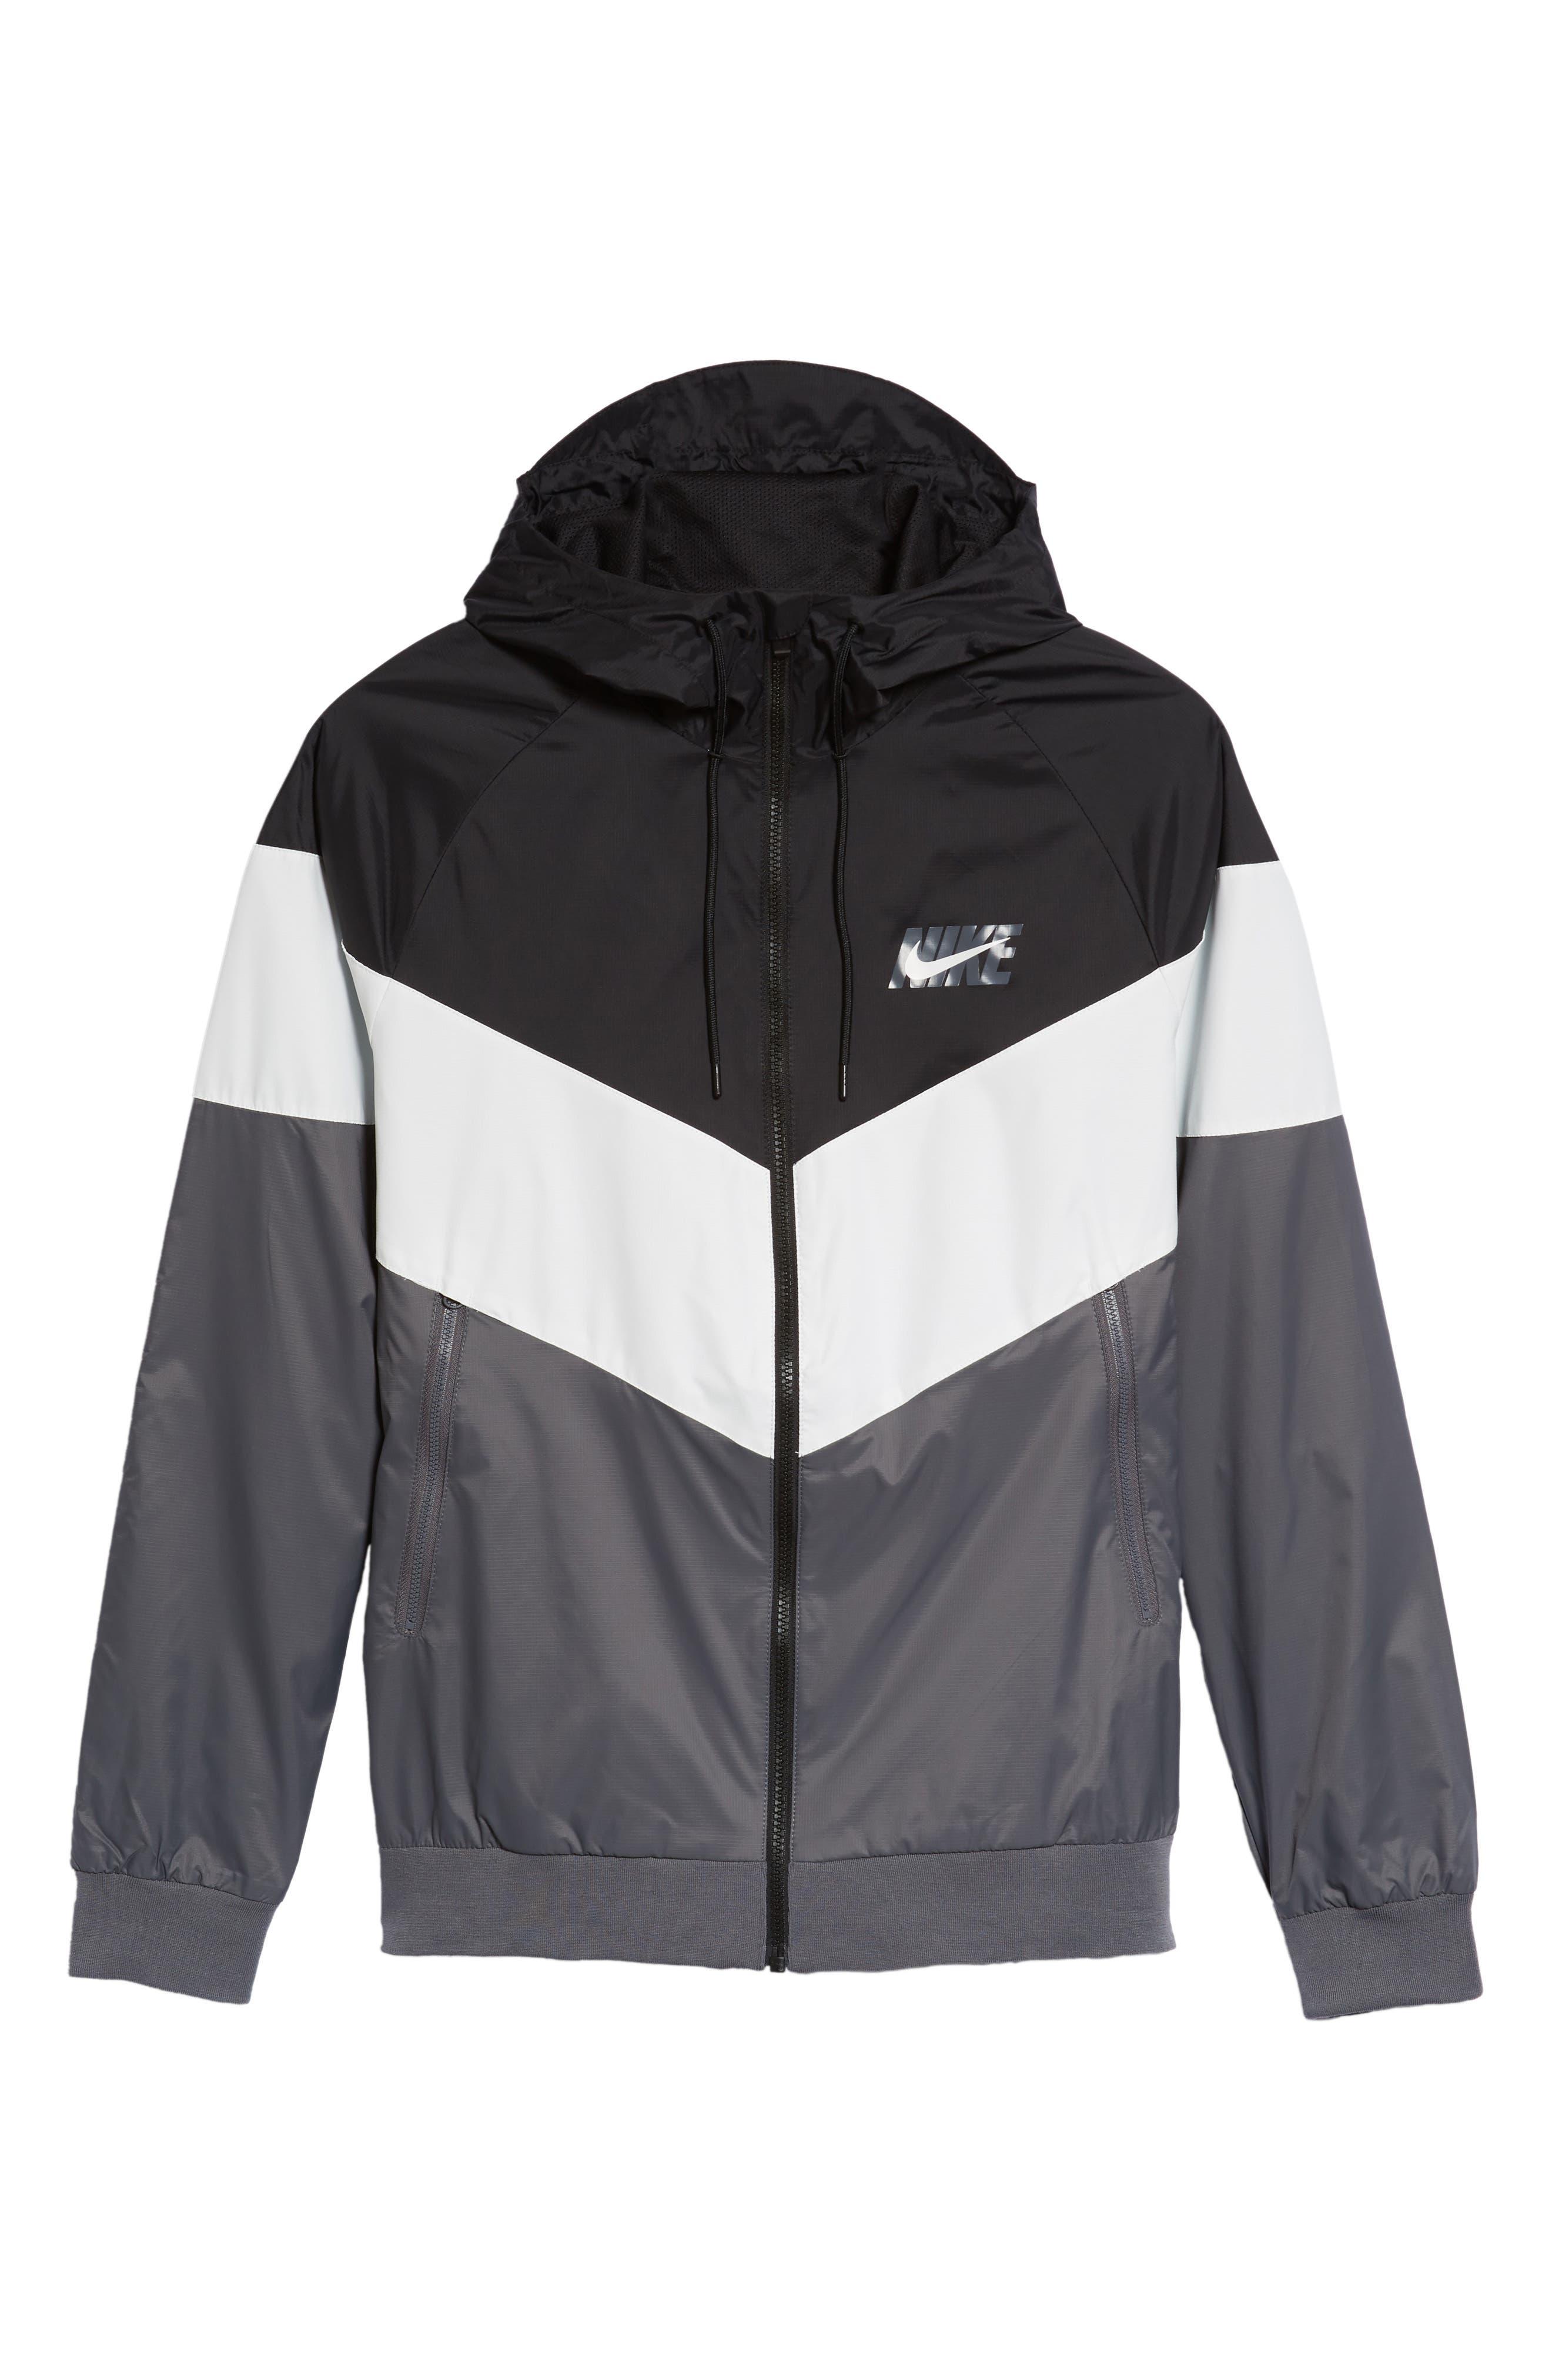 Windrunner Wind & Water Repellent Hooded Jacket,                             Alternate thumbnail 6, color,                             BLACK/ SUMMIT WHITE/ DARK GREY